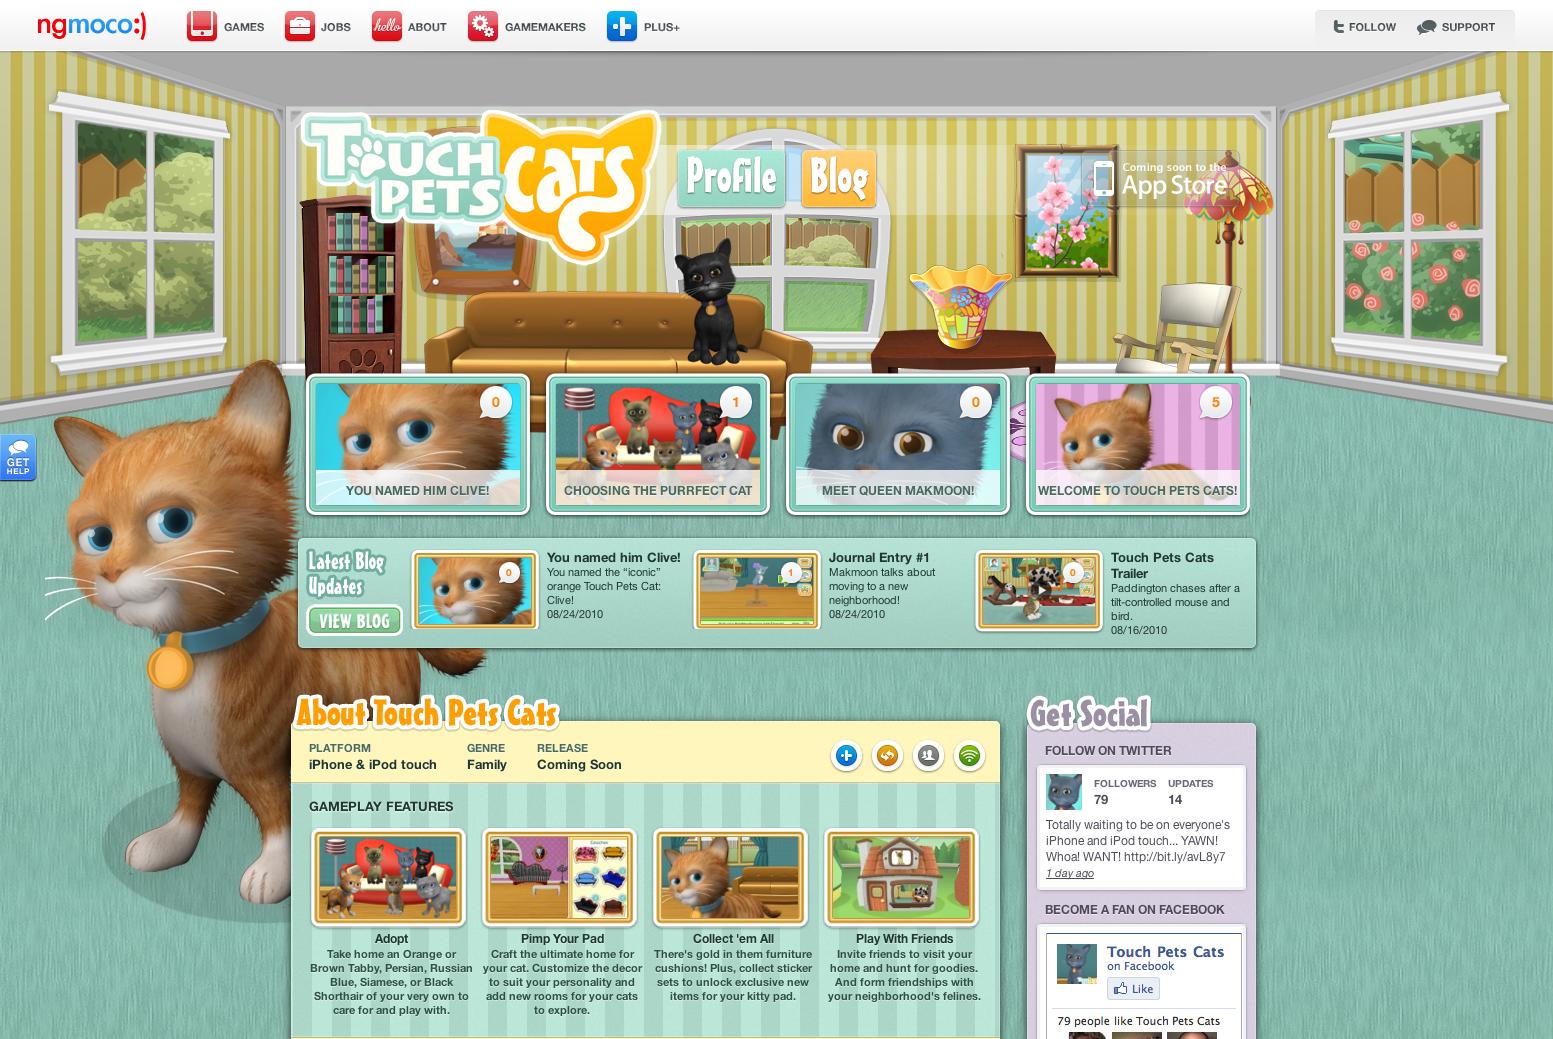 ngmoco:) TouchPets Cats WordPress Theme: Header 1